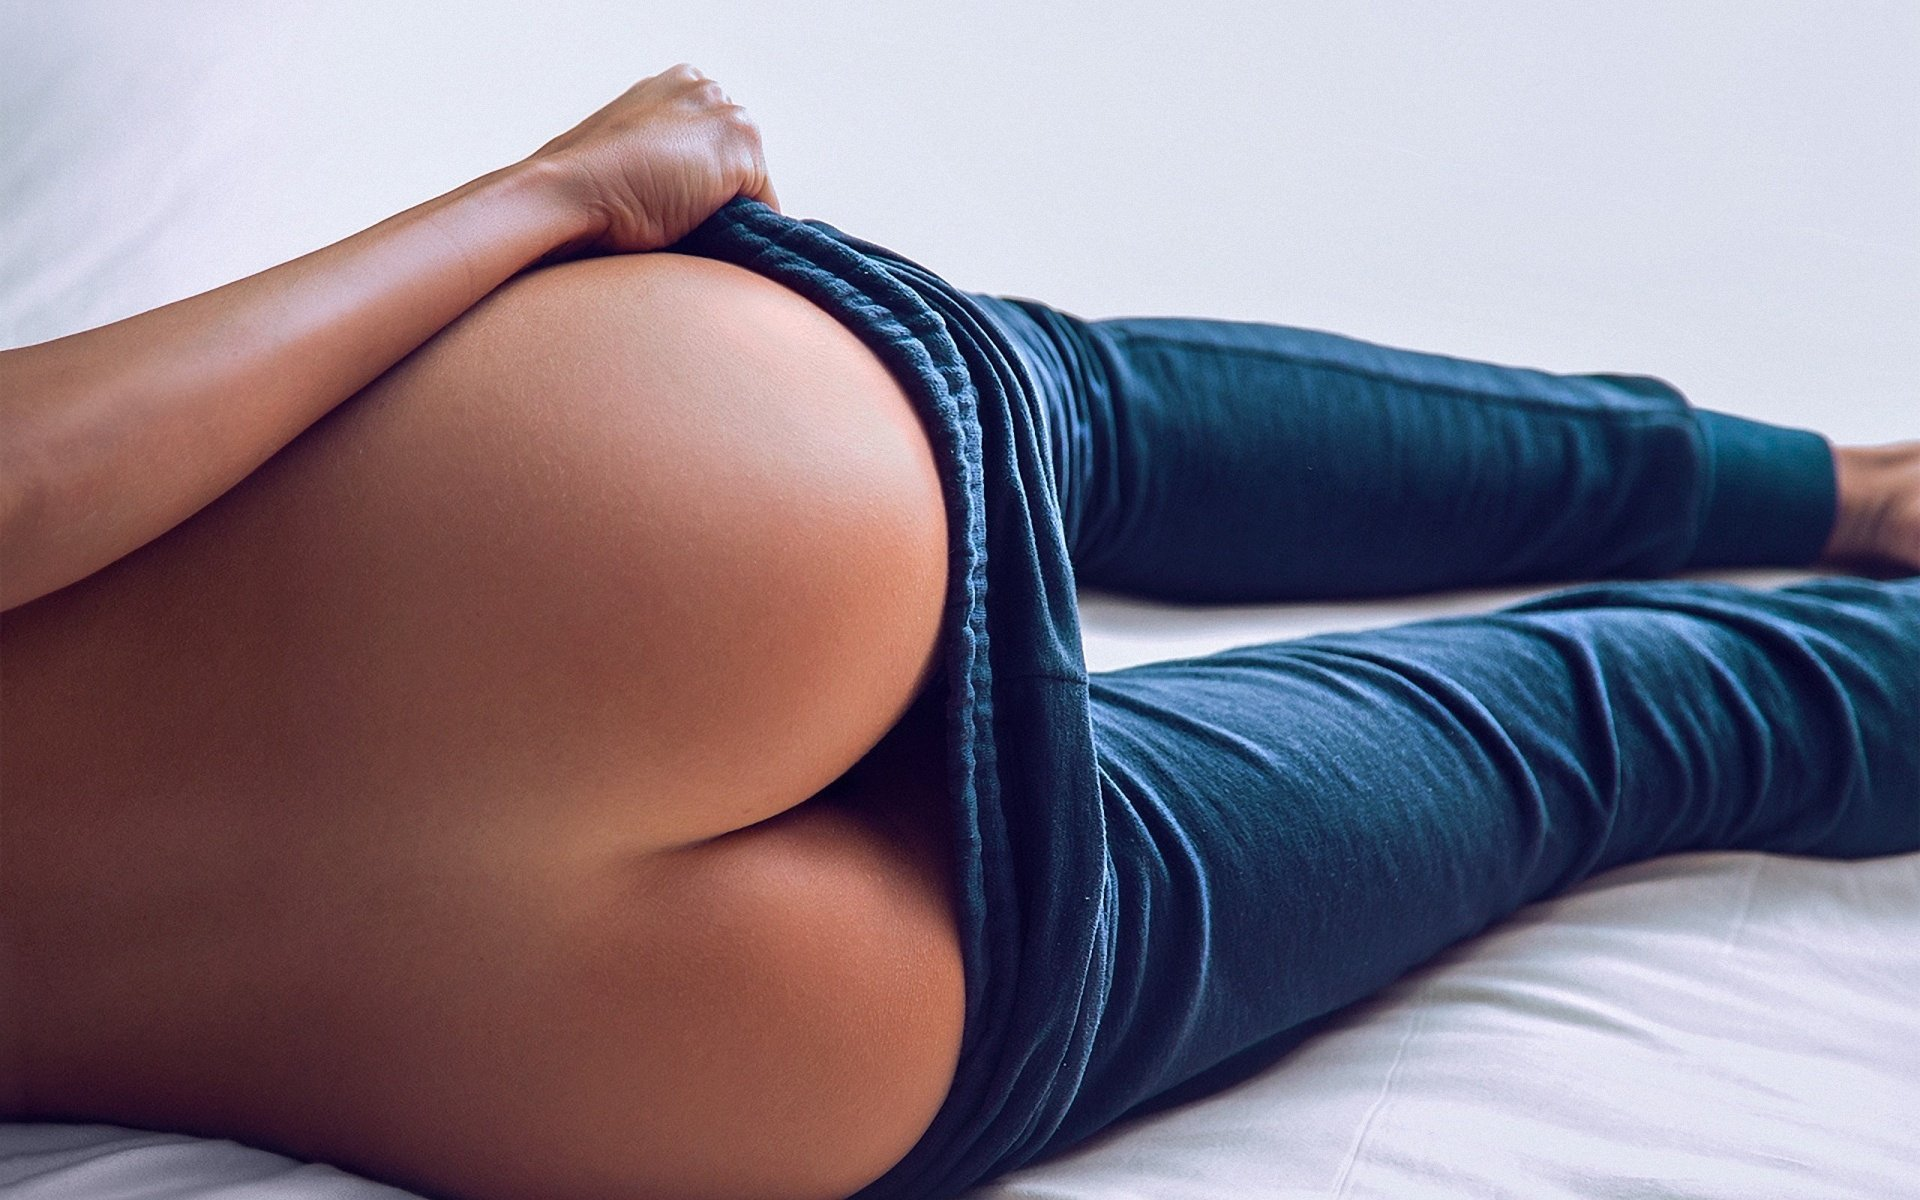 Эротика в джинсах фото 15 фотография